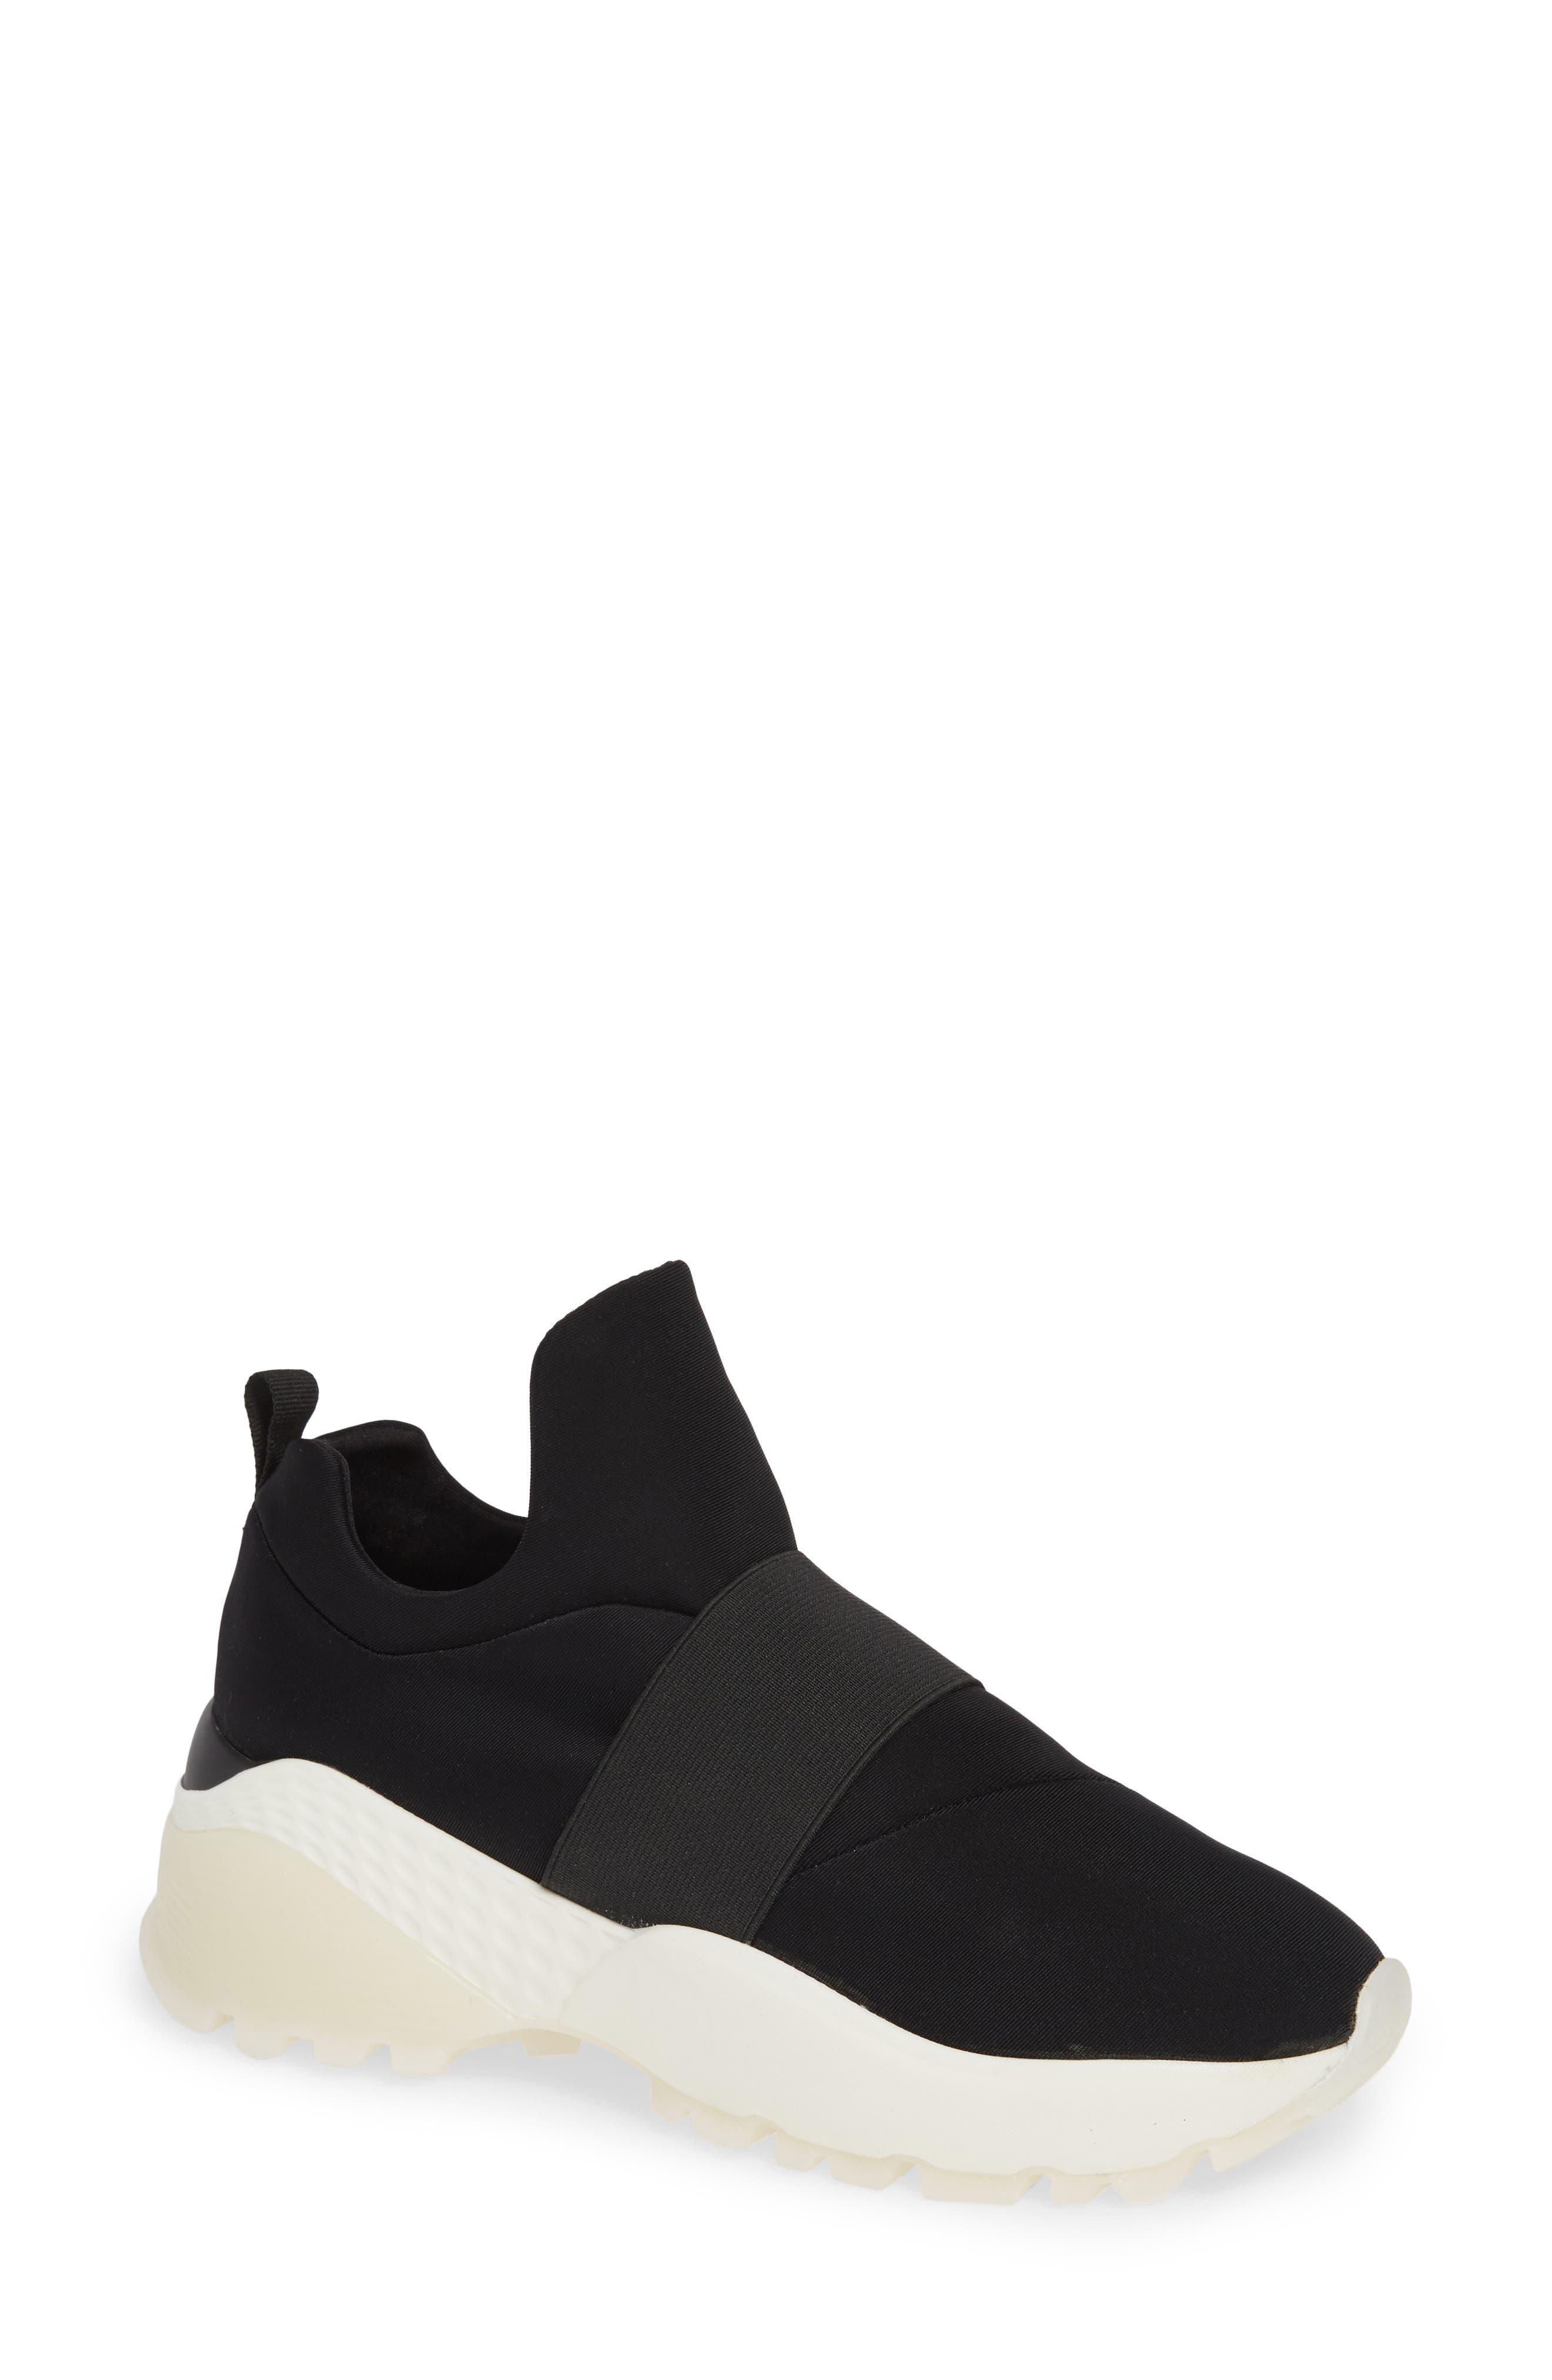 Jslides Slip-On Sneaker, Black